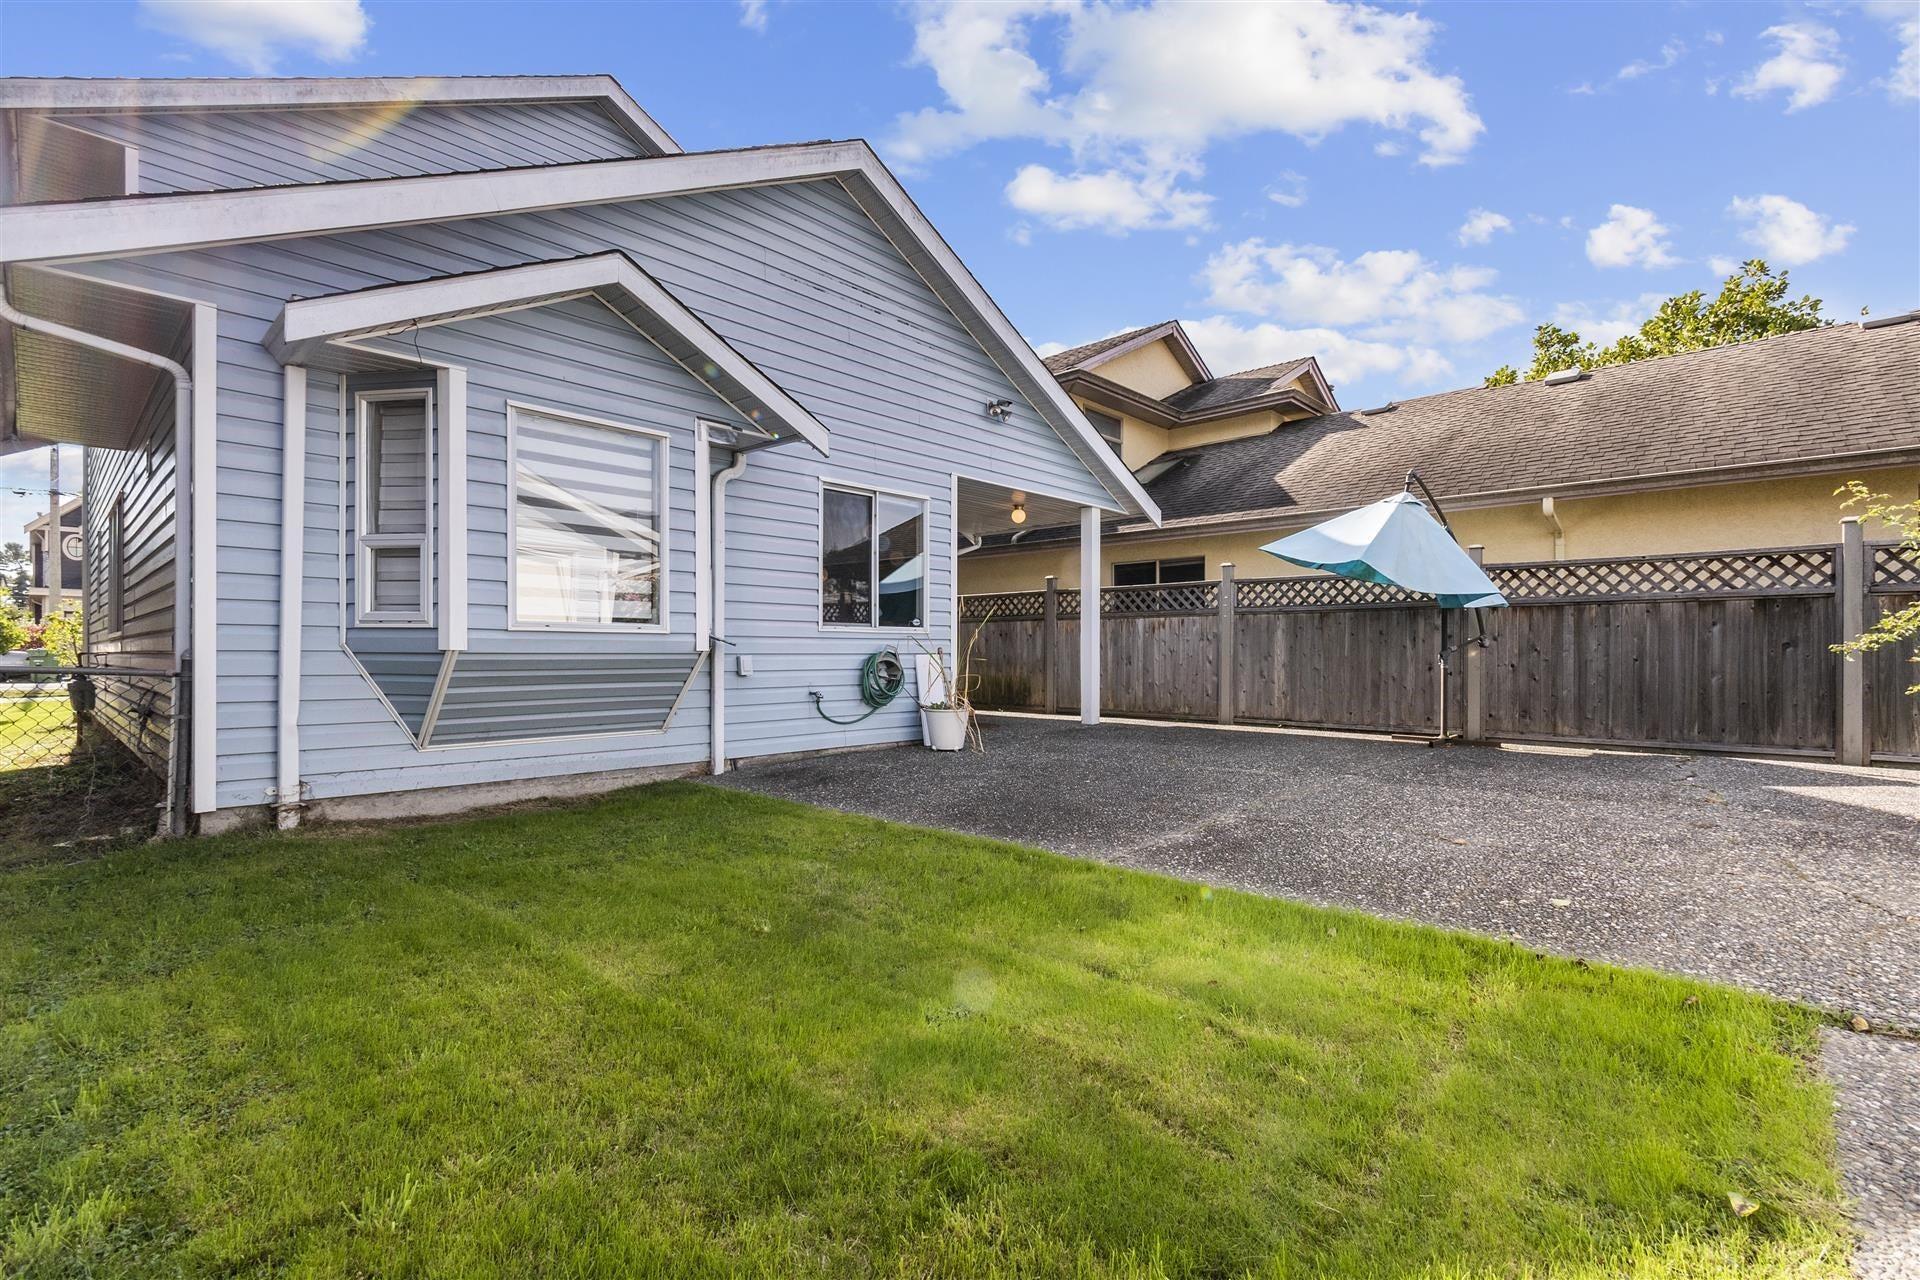 3631 GEORGIA STREET - Steveston Village House/Single Family for sale, 3 Bedrooms (R2623894) - #16